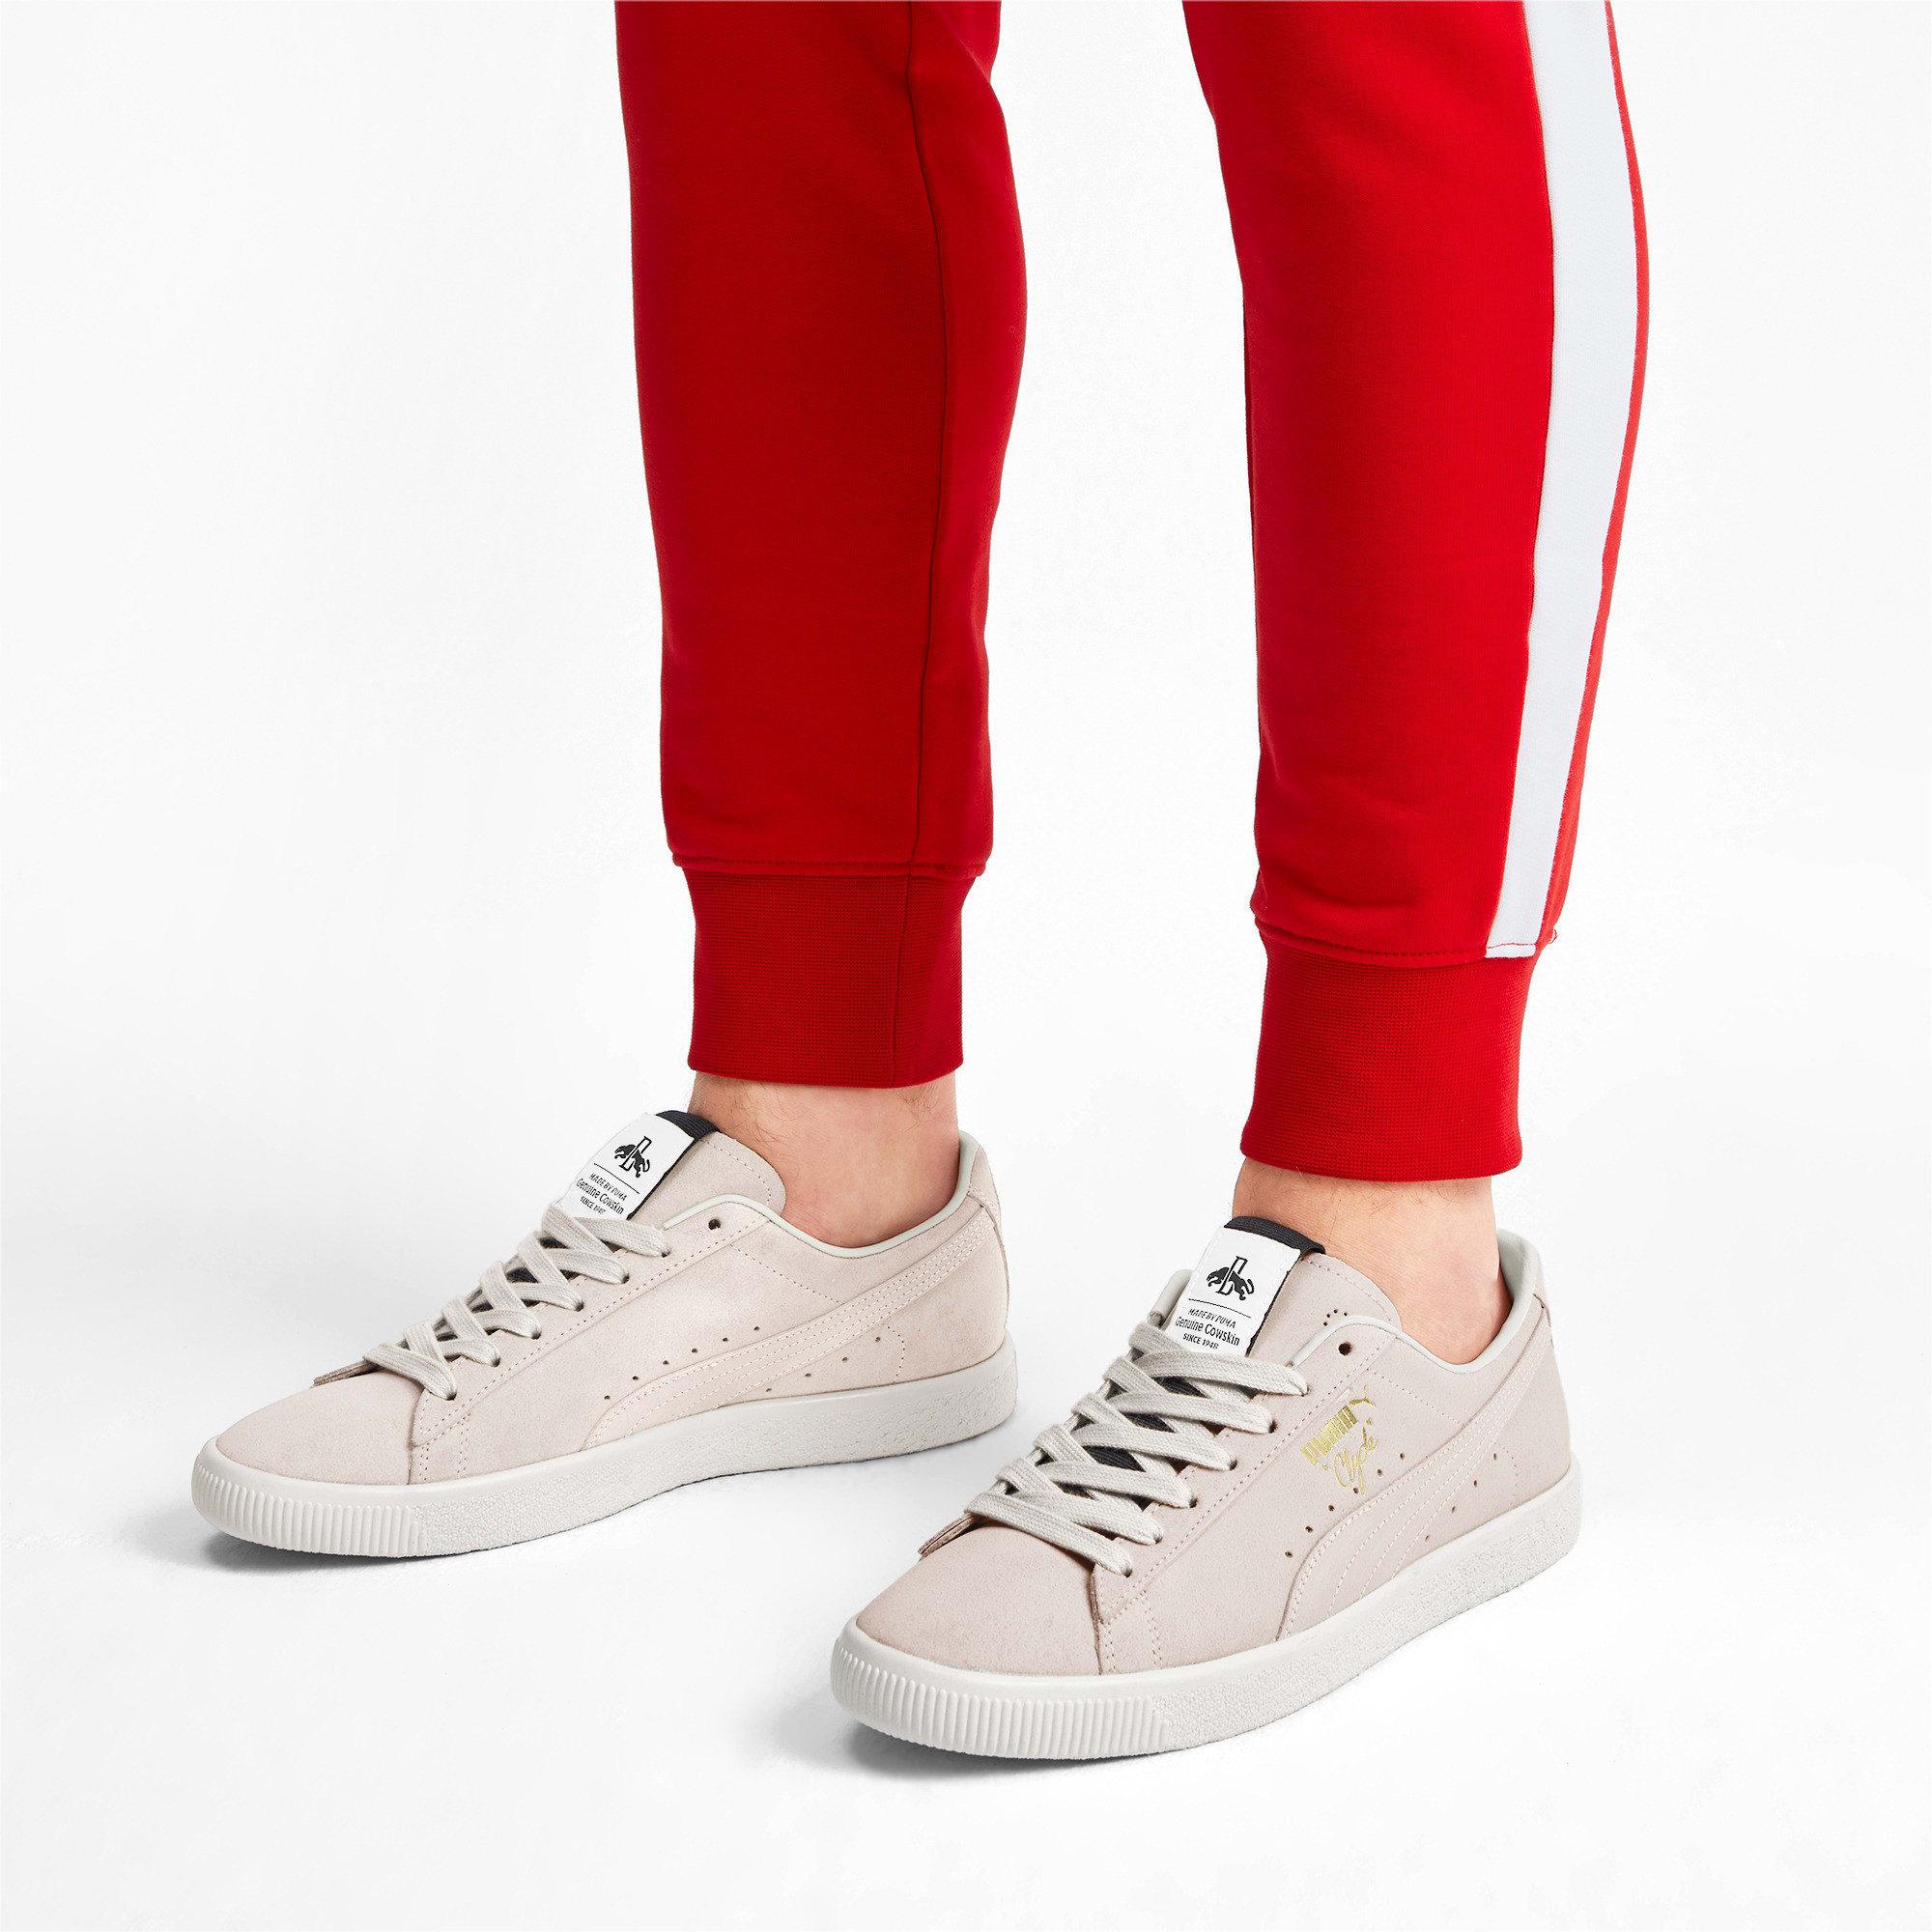 Thumbnail 3 of Clyde Fedora Sneakers, Whisper Wht-P Blk-WhisperWht, medium